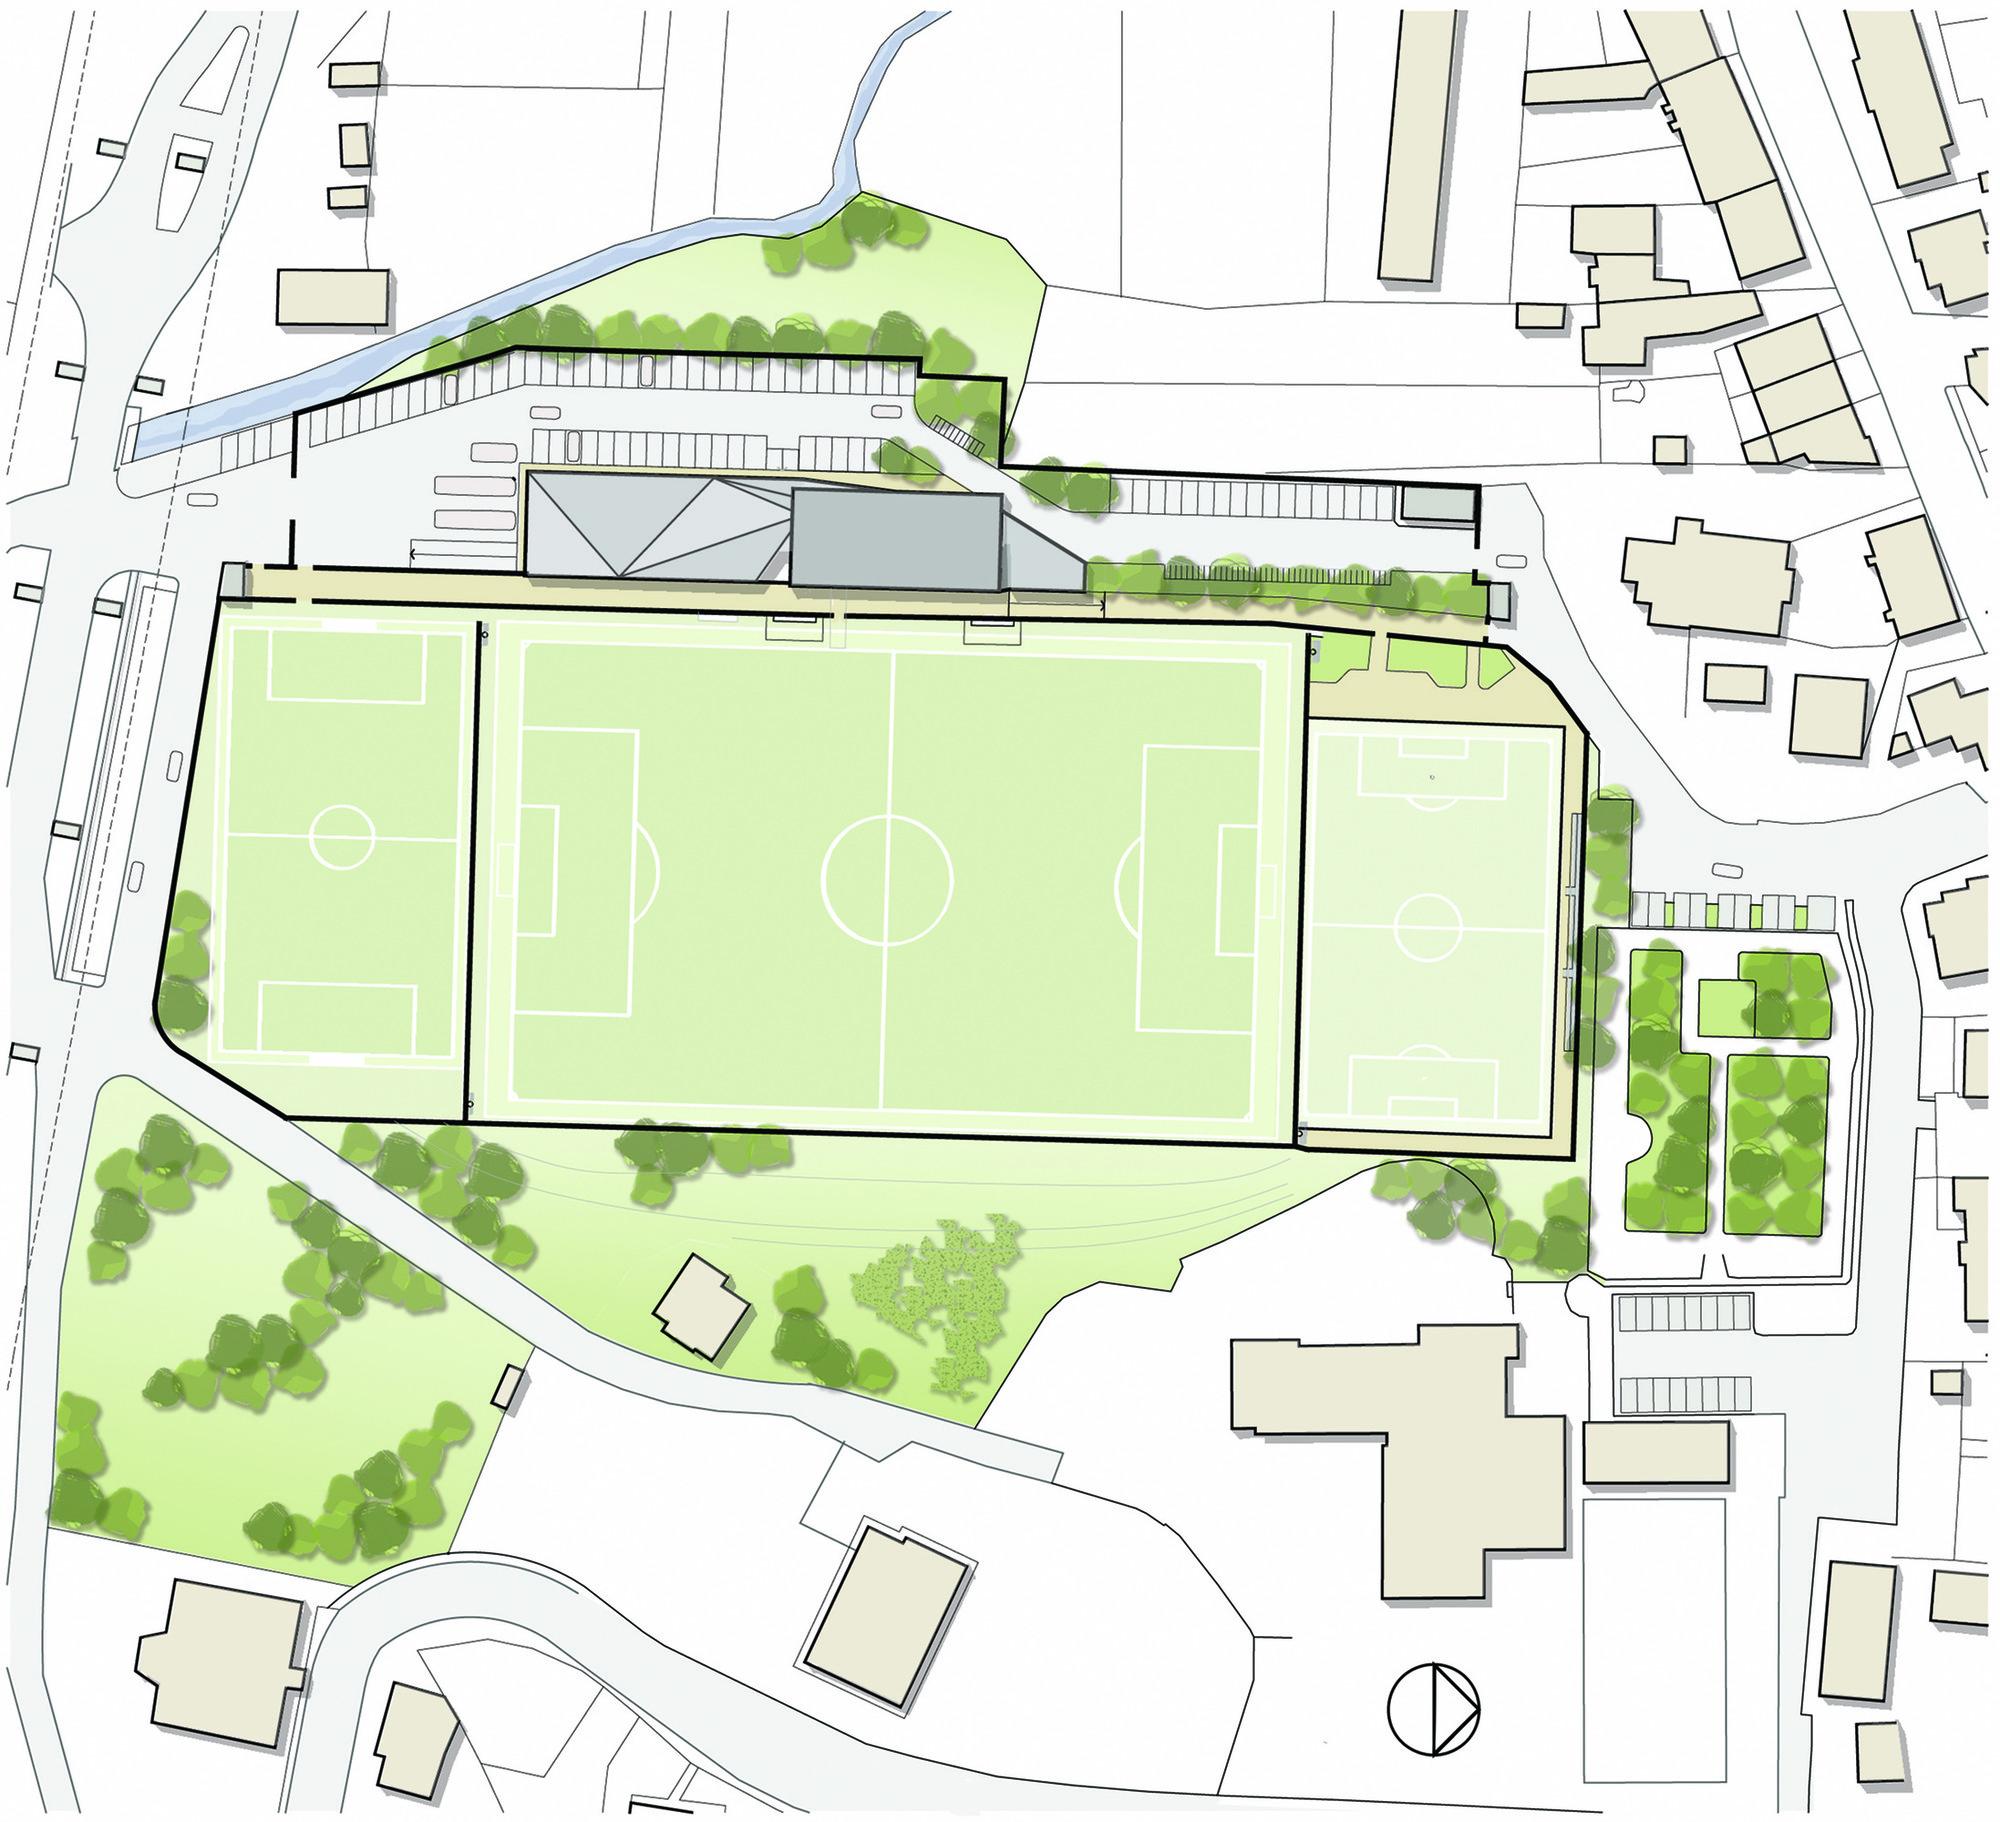 Ferdeghini sport complex frigerio design group archdaily for Sports complex planning design